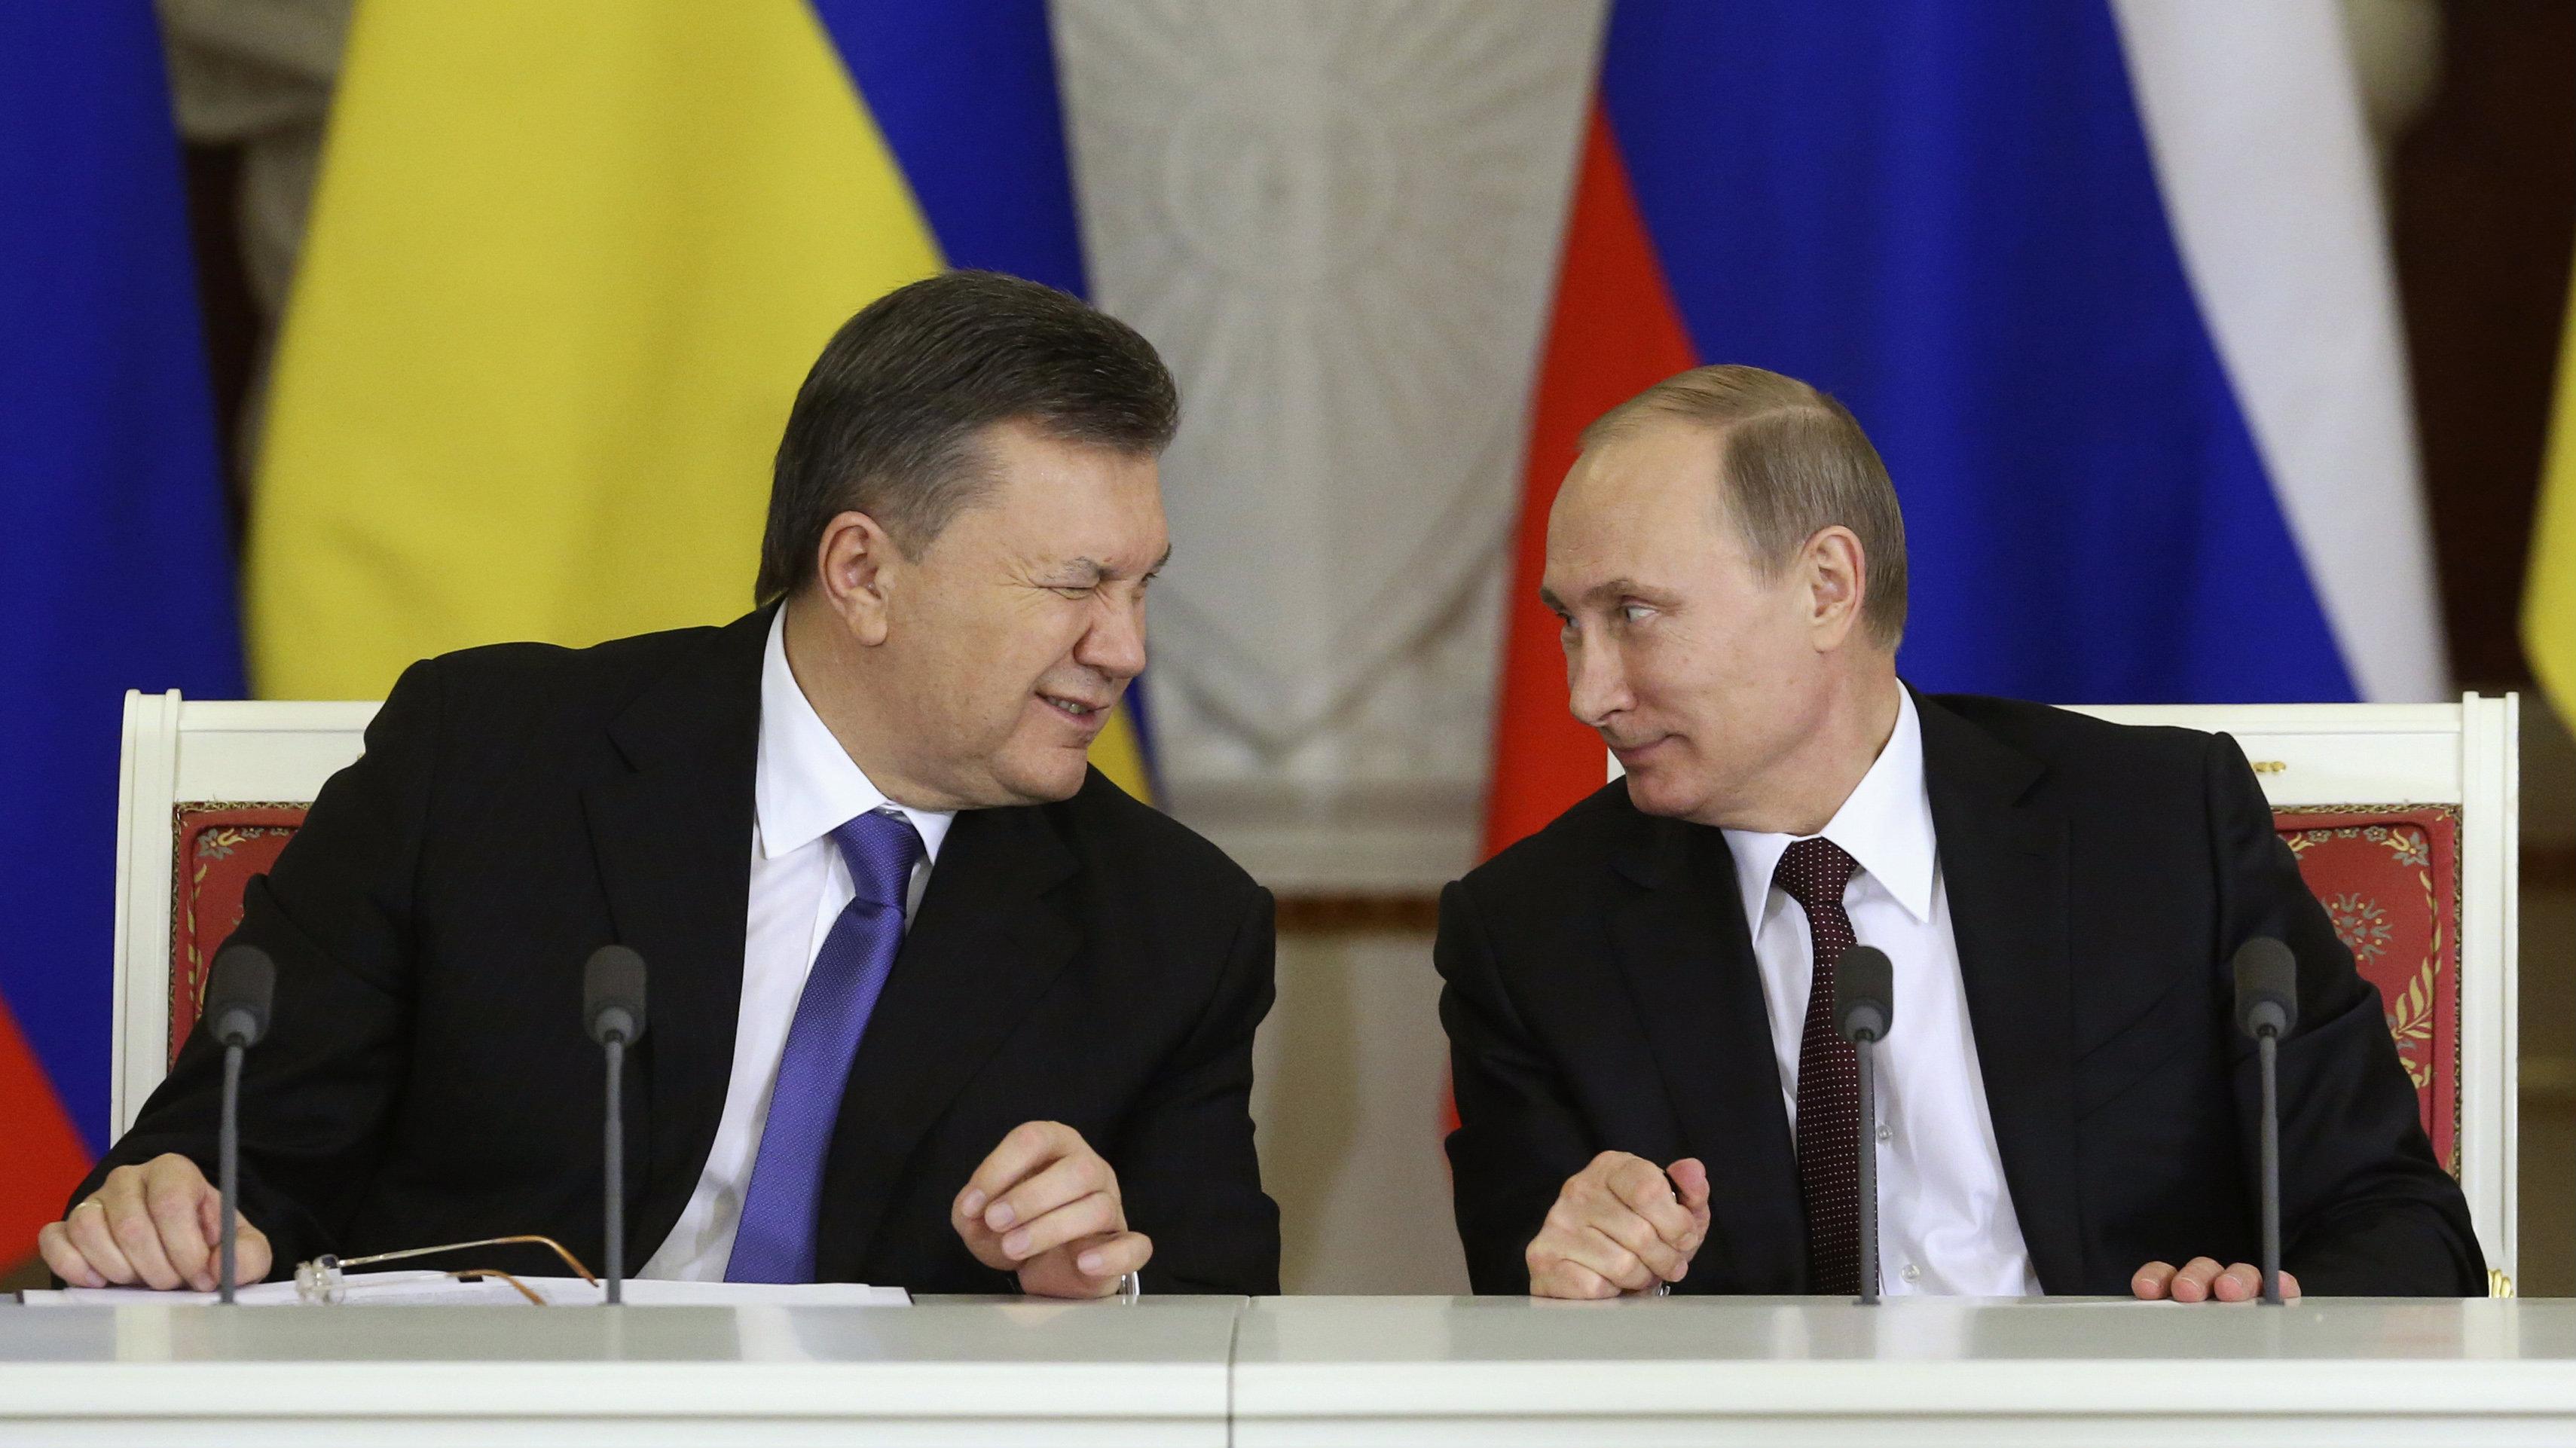 ukraine pres winking at putin